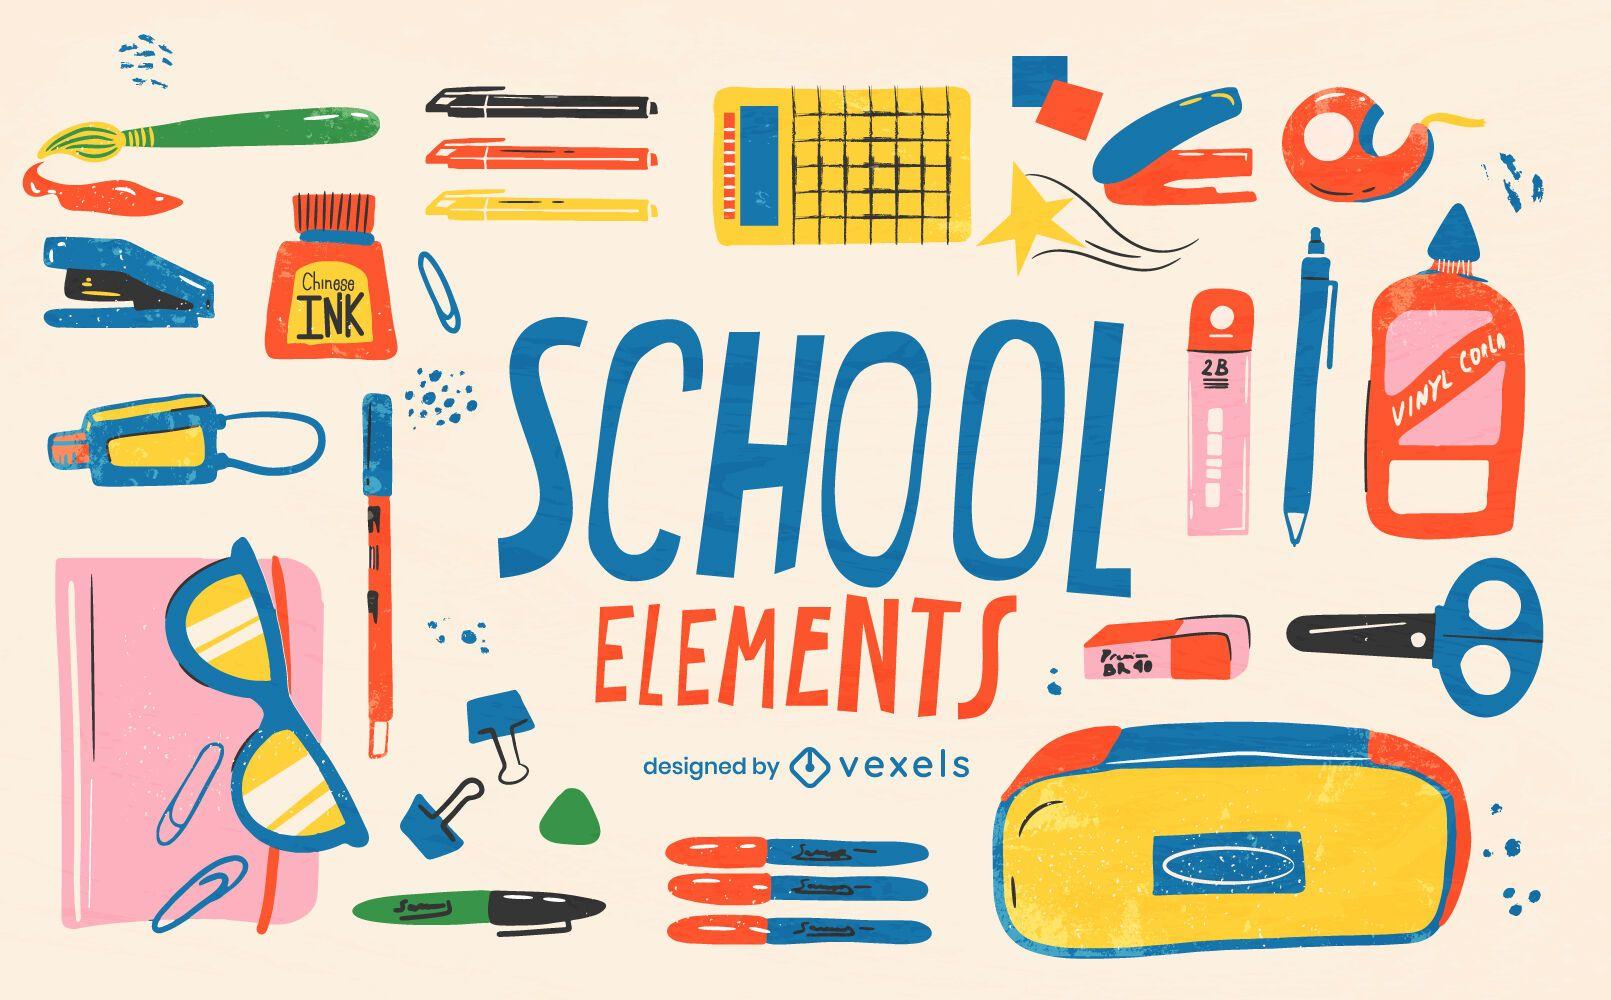 Voltar ao conjunto de elementos de material escolar